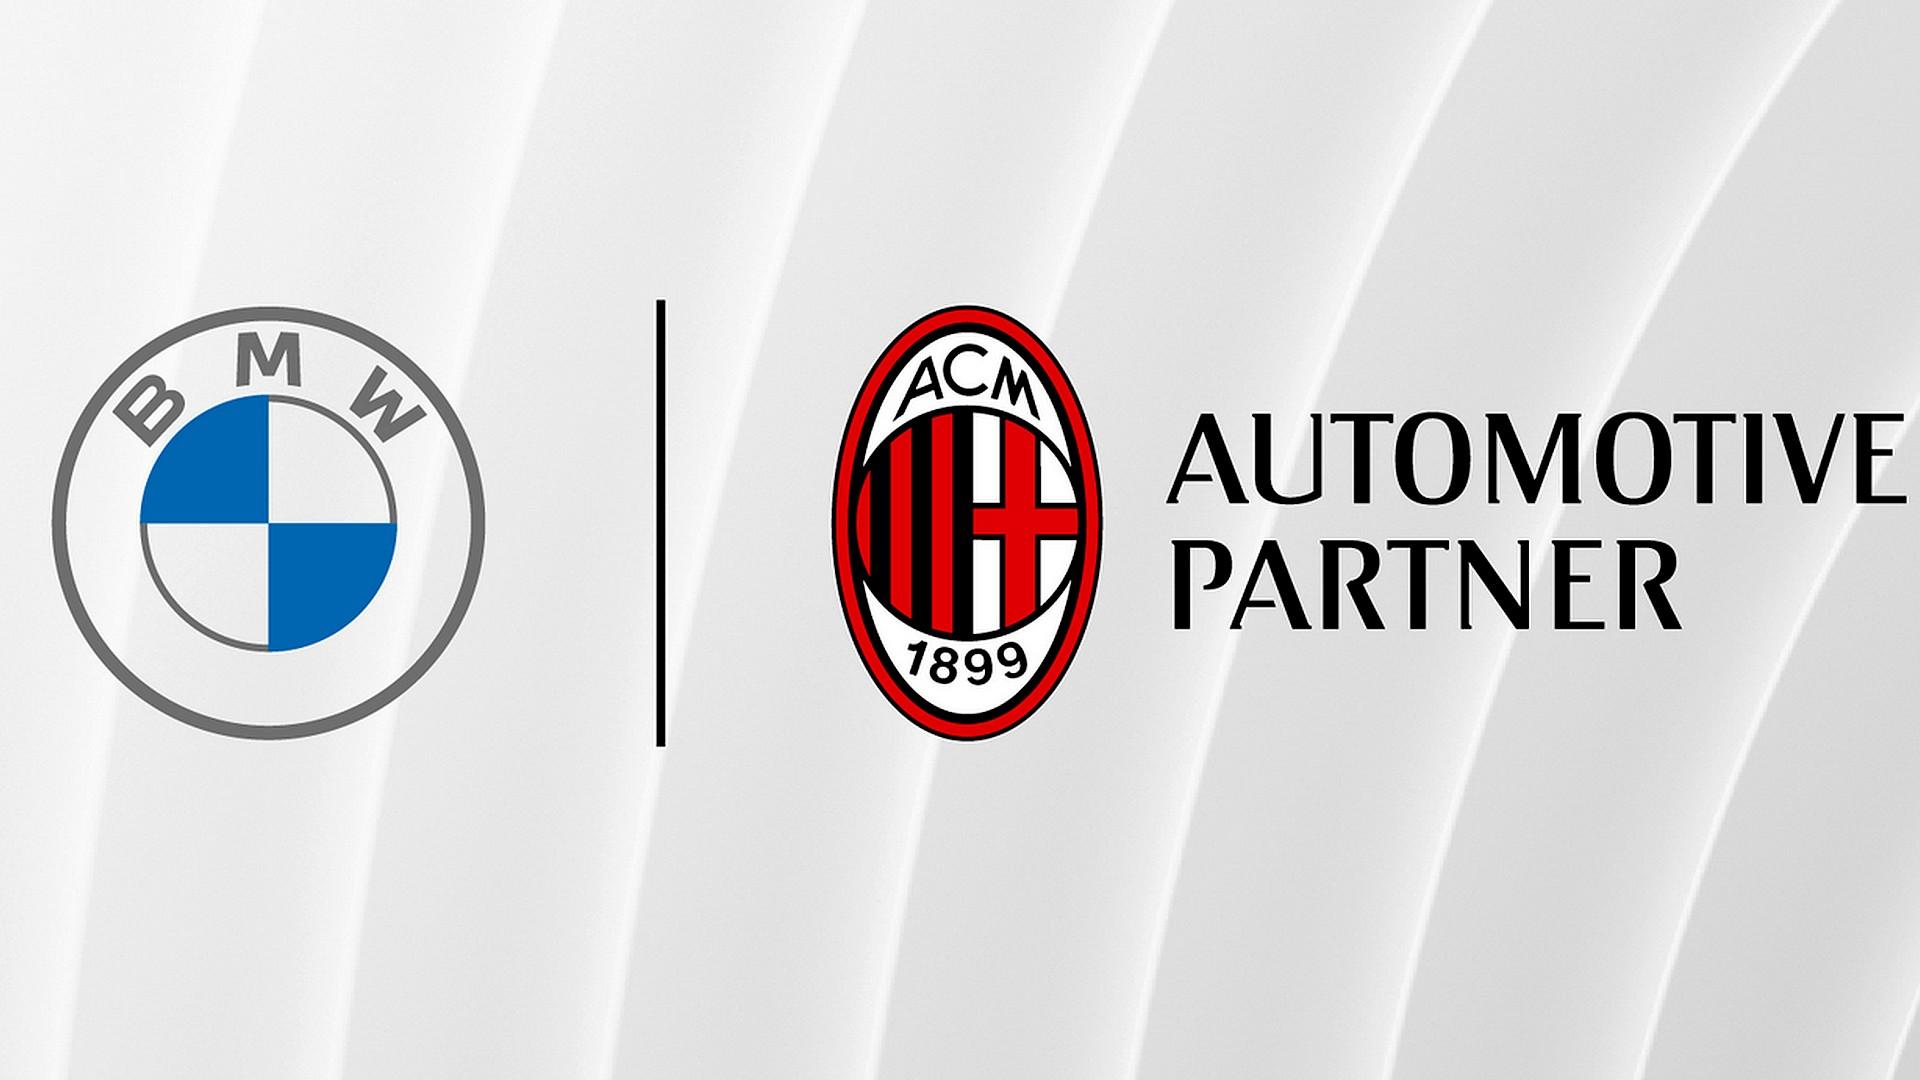 BMW x AC Milan (football) 2021